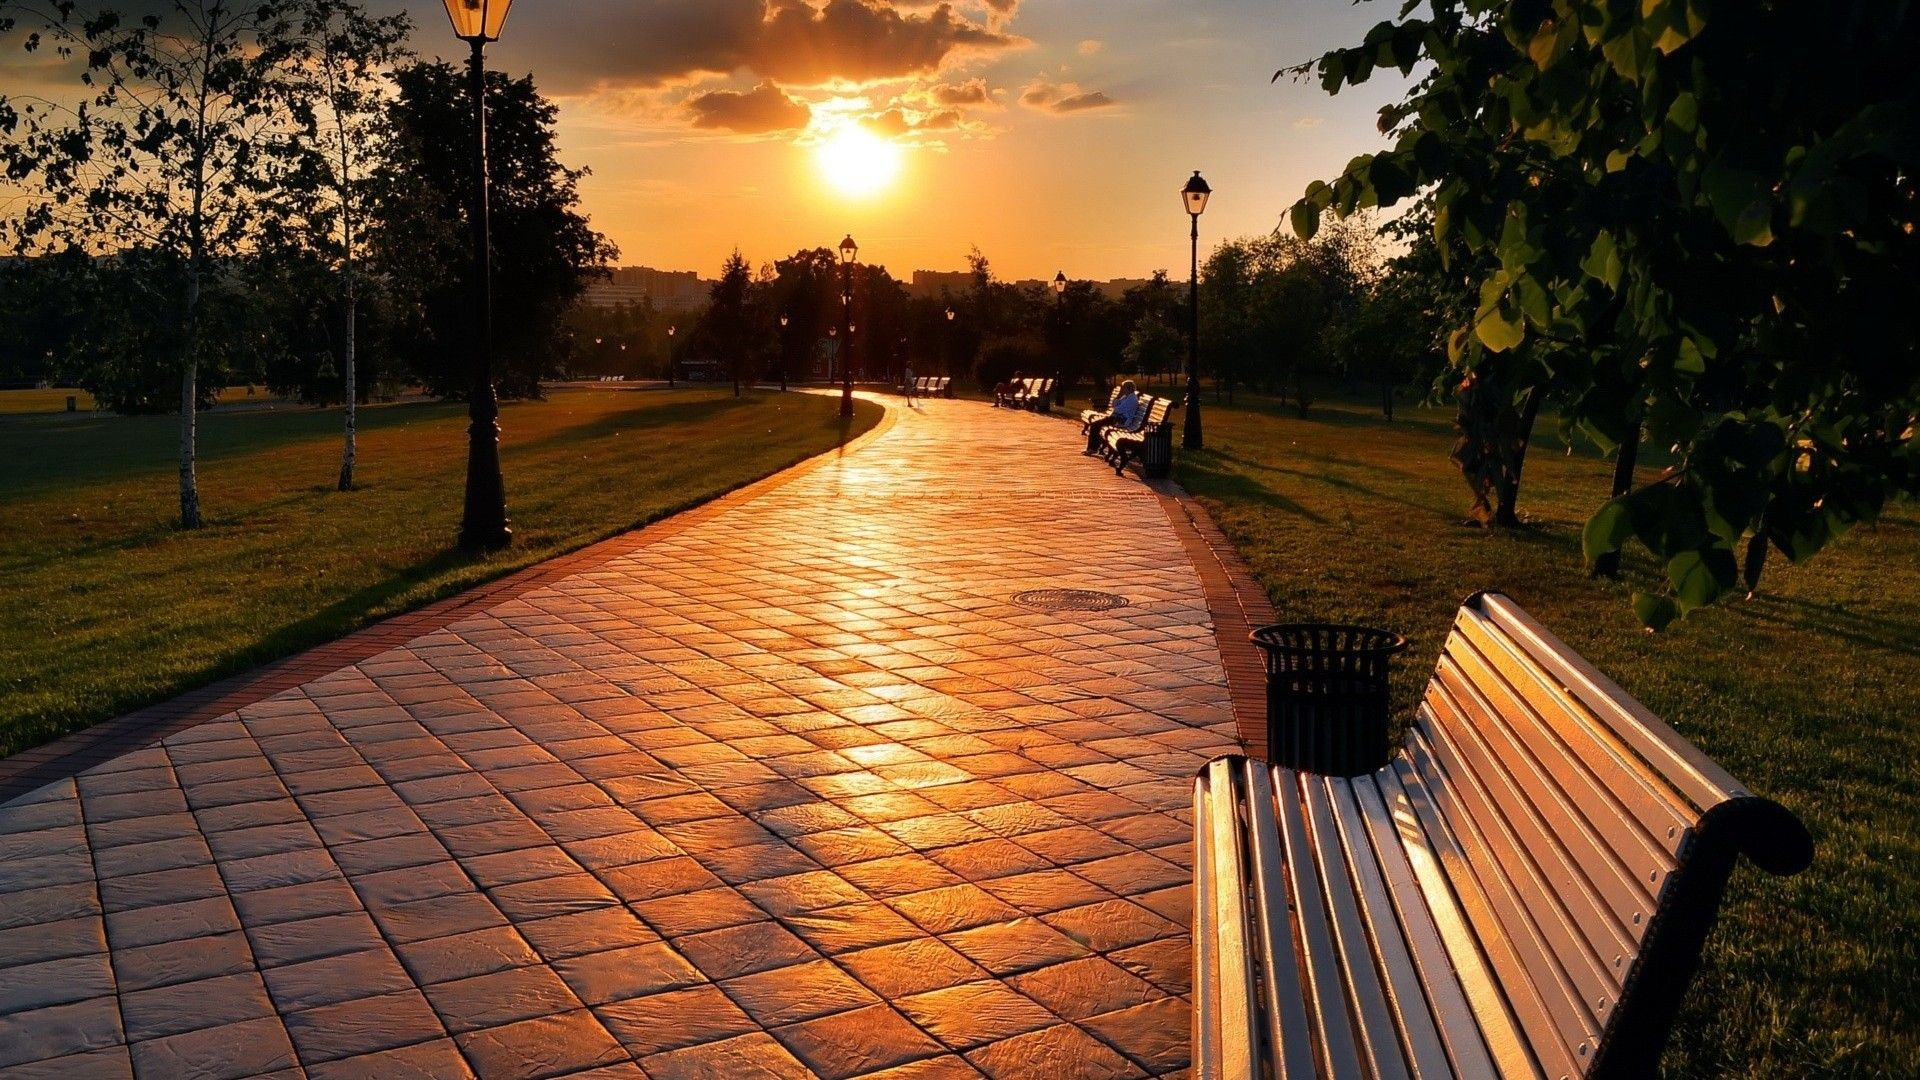 Sunset In Park #7007018